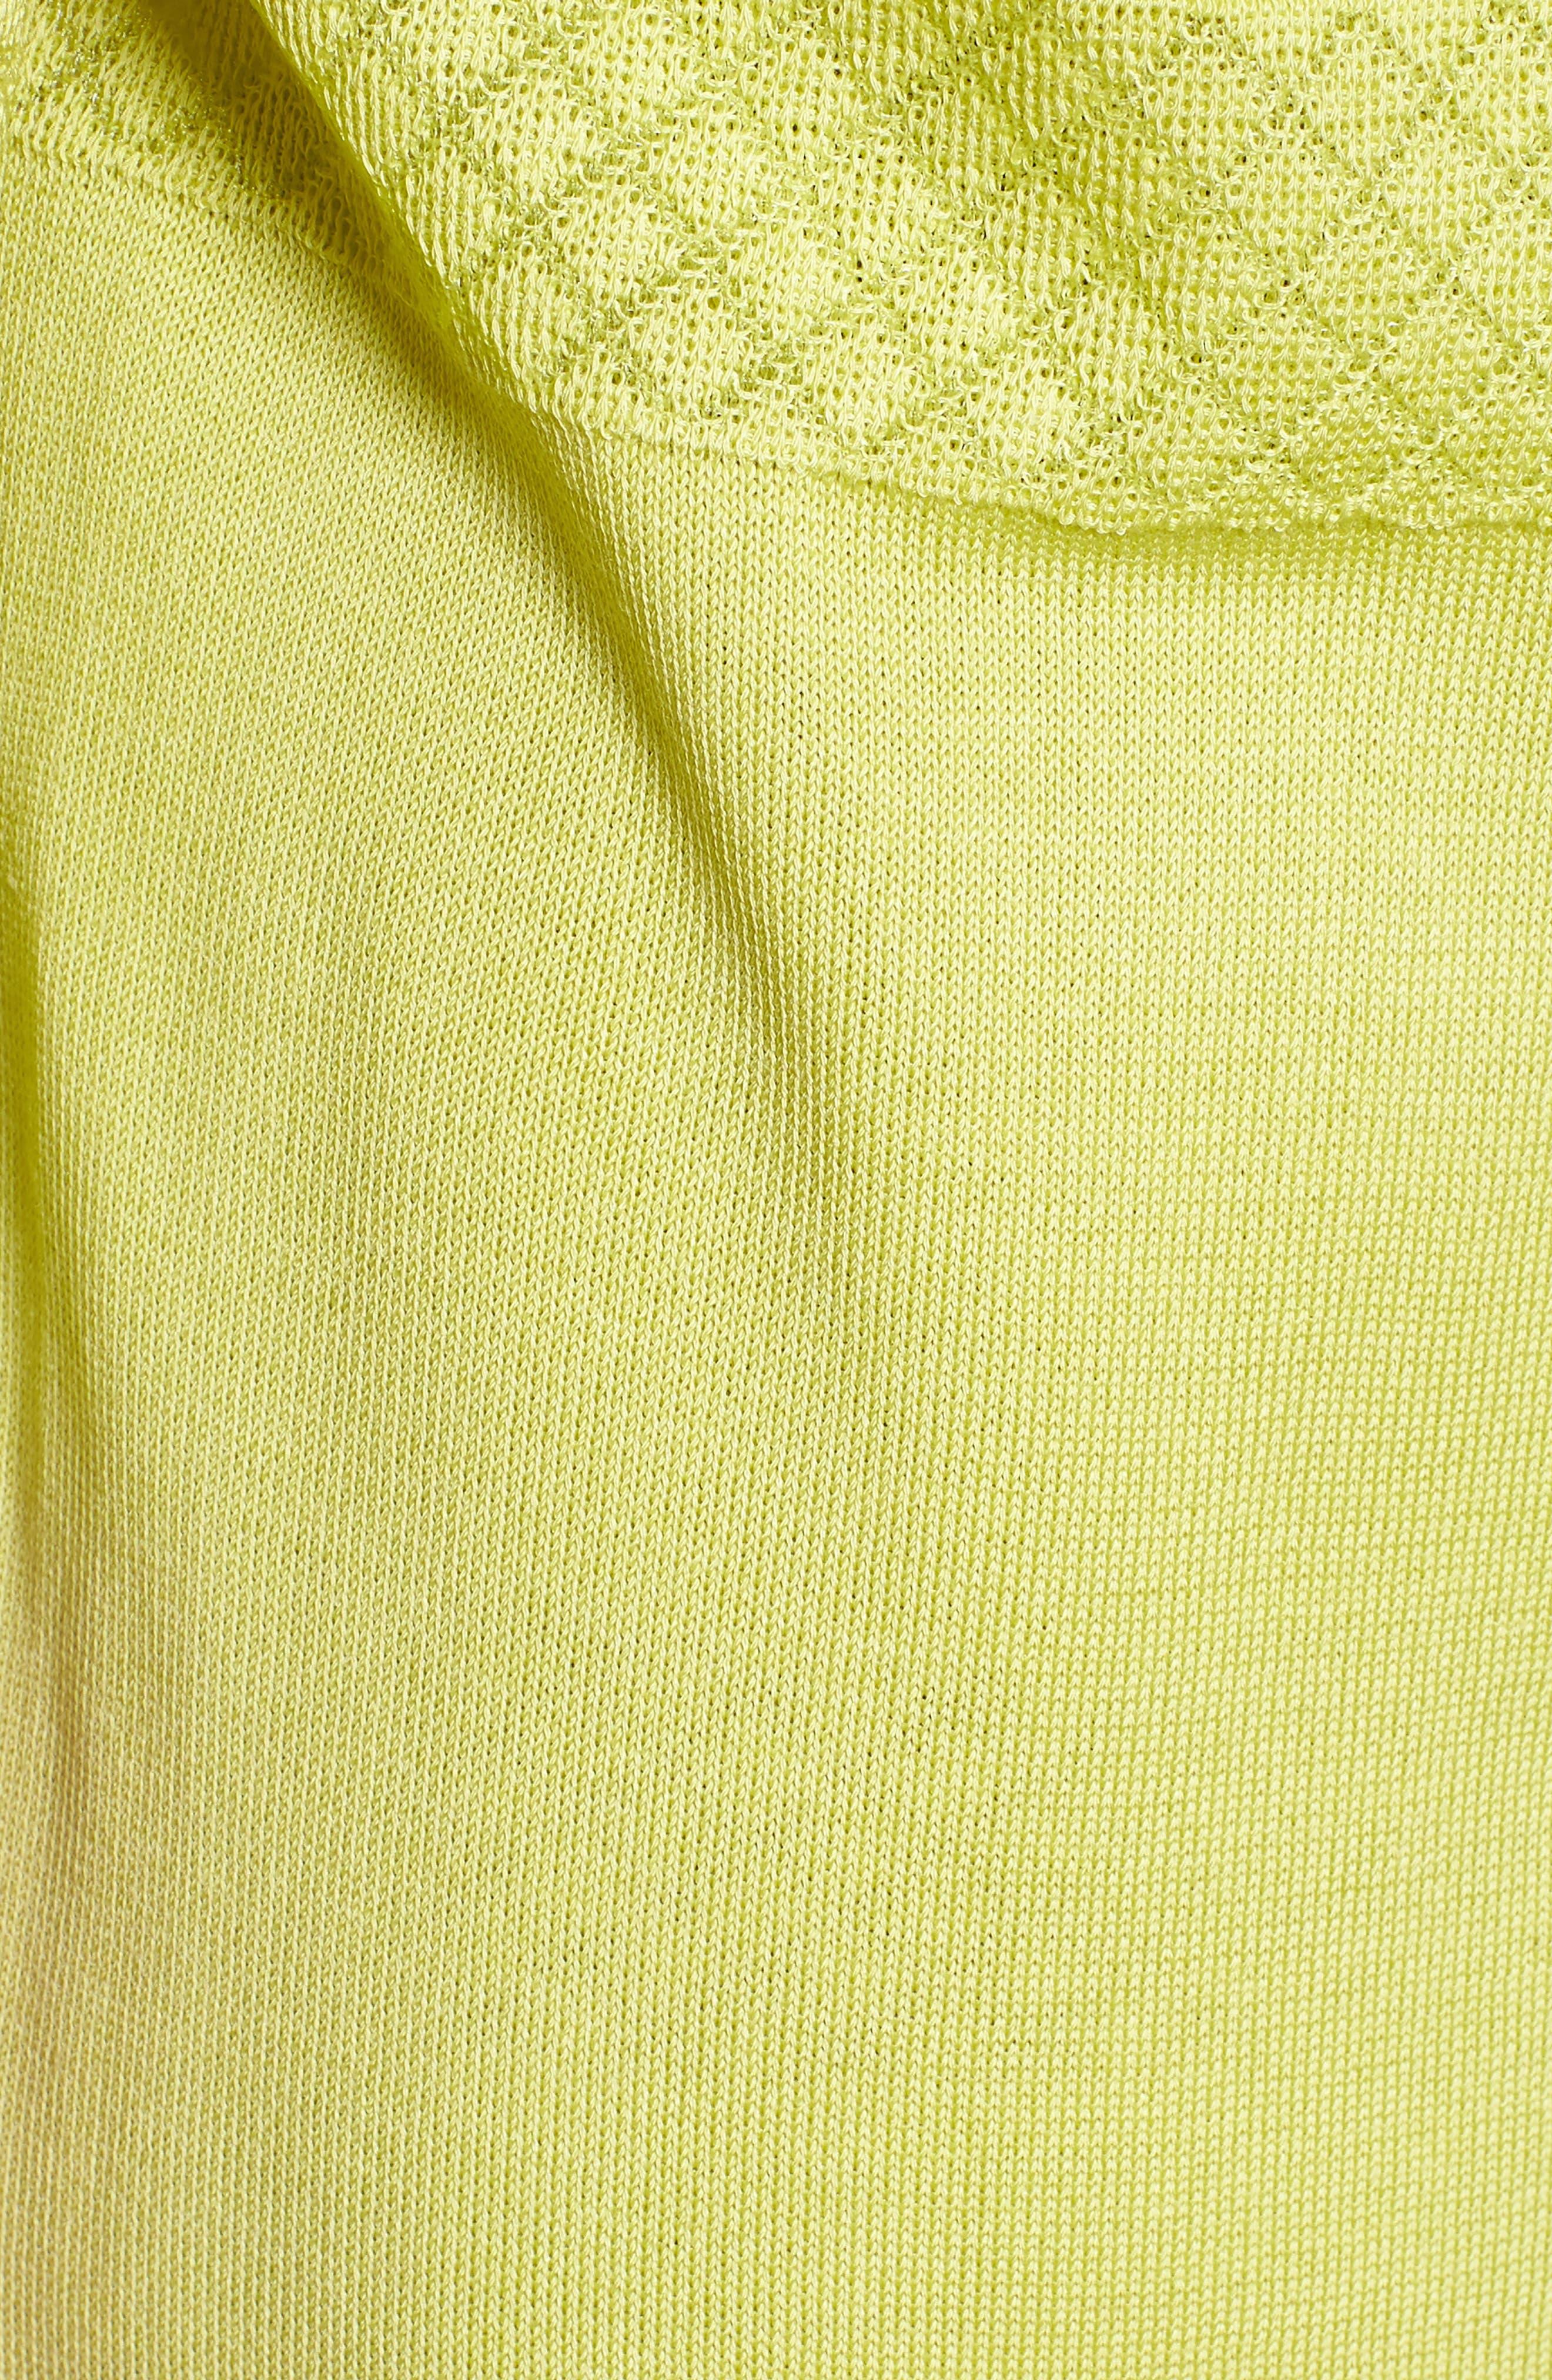 Long Jacquard Knit Jacket,                             Alternate thumbnail 5, color,                             Aurora